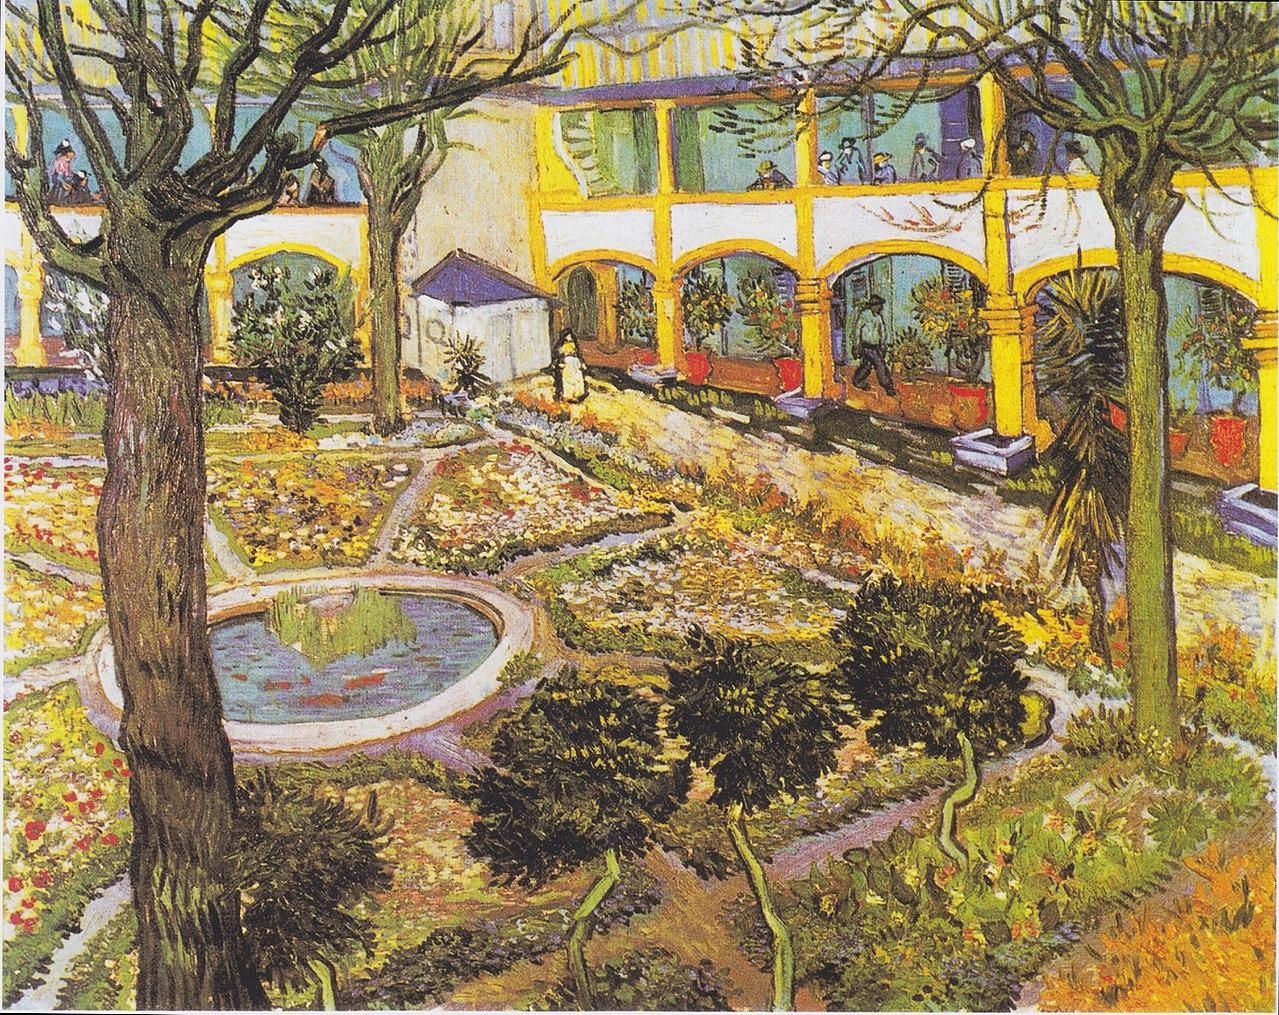 Van Gogh 1889 April Jardin de l'hopital d'Arles Sammlung Oskar Reinhart, Winterthur F519